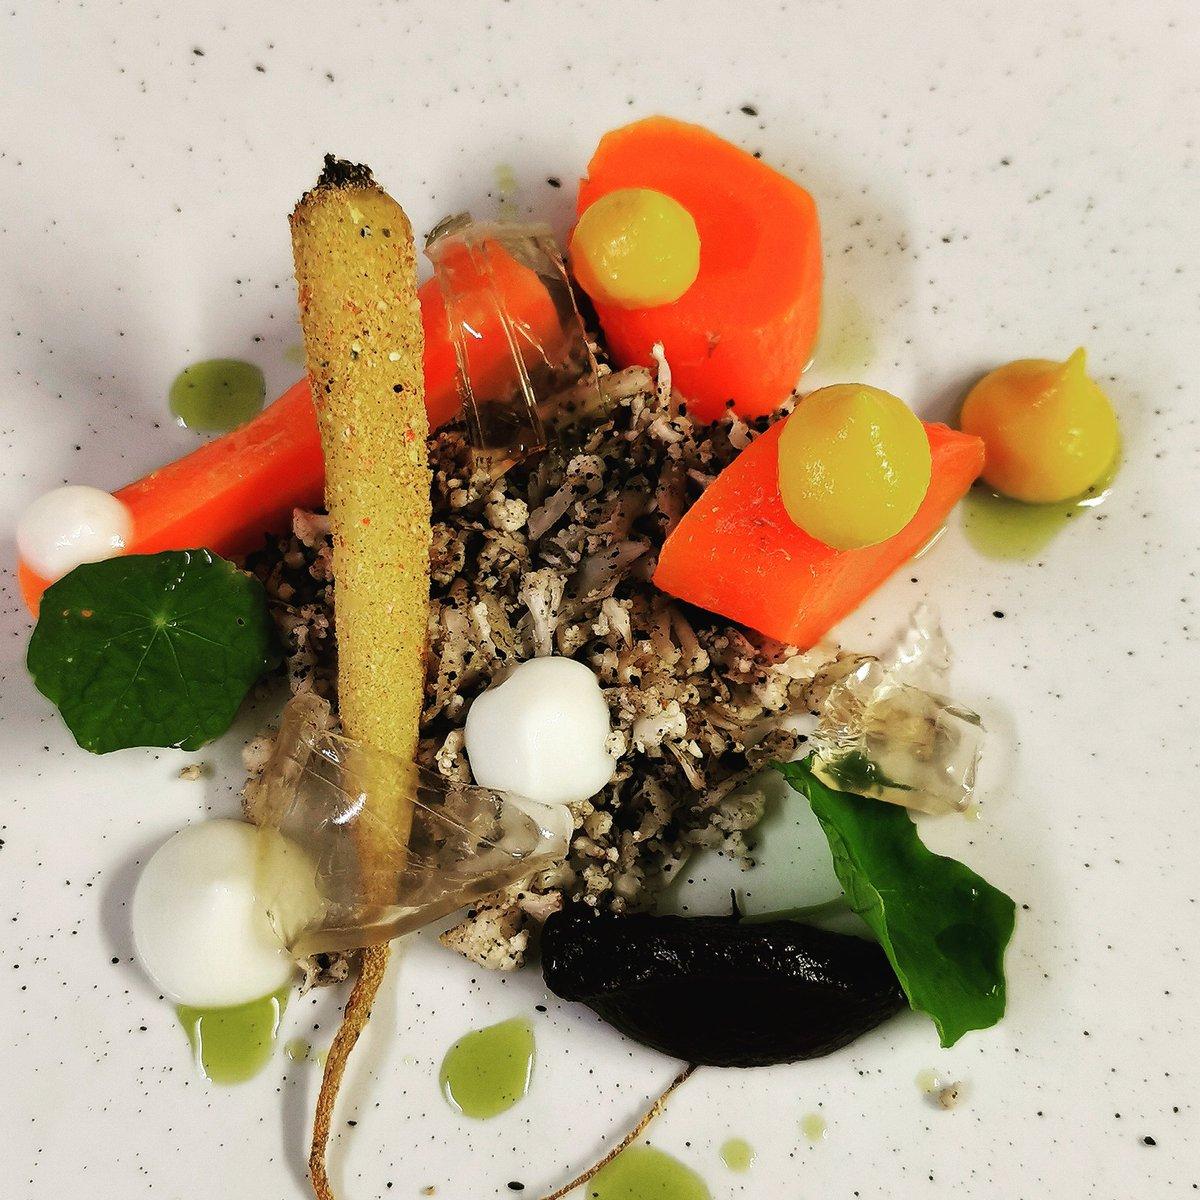 Sage's garden- carrots (salt baked, confit in duck fat, glazed), vegetable soil, fermented tomato gelly, red cabbage. pic.twitter.com/7pNRvIwilc